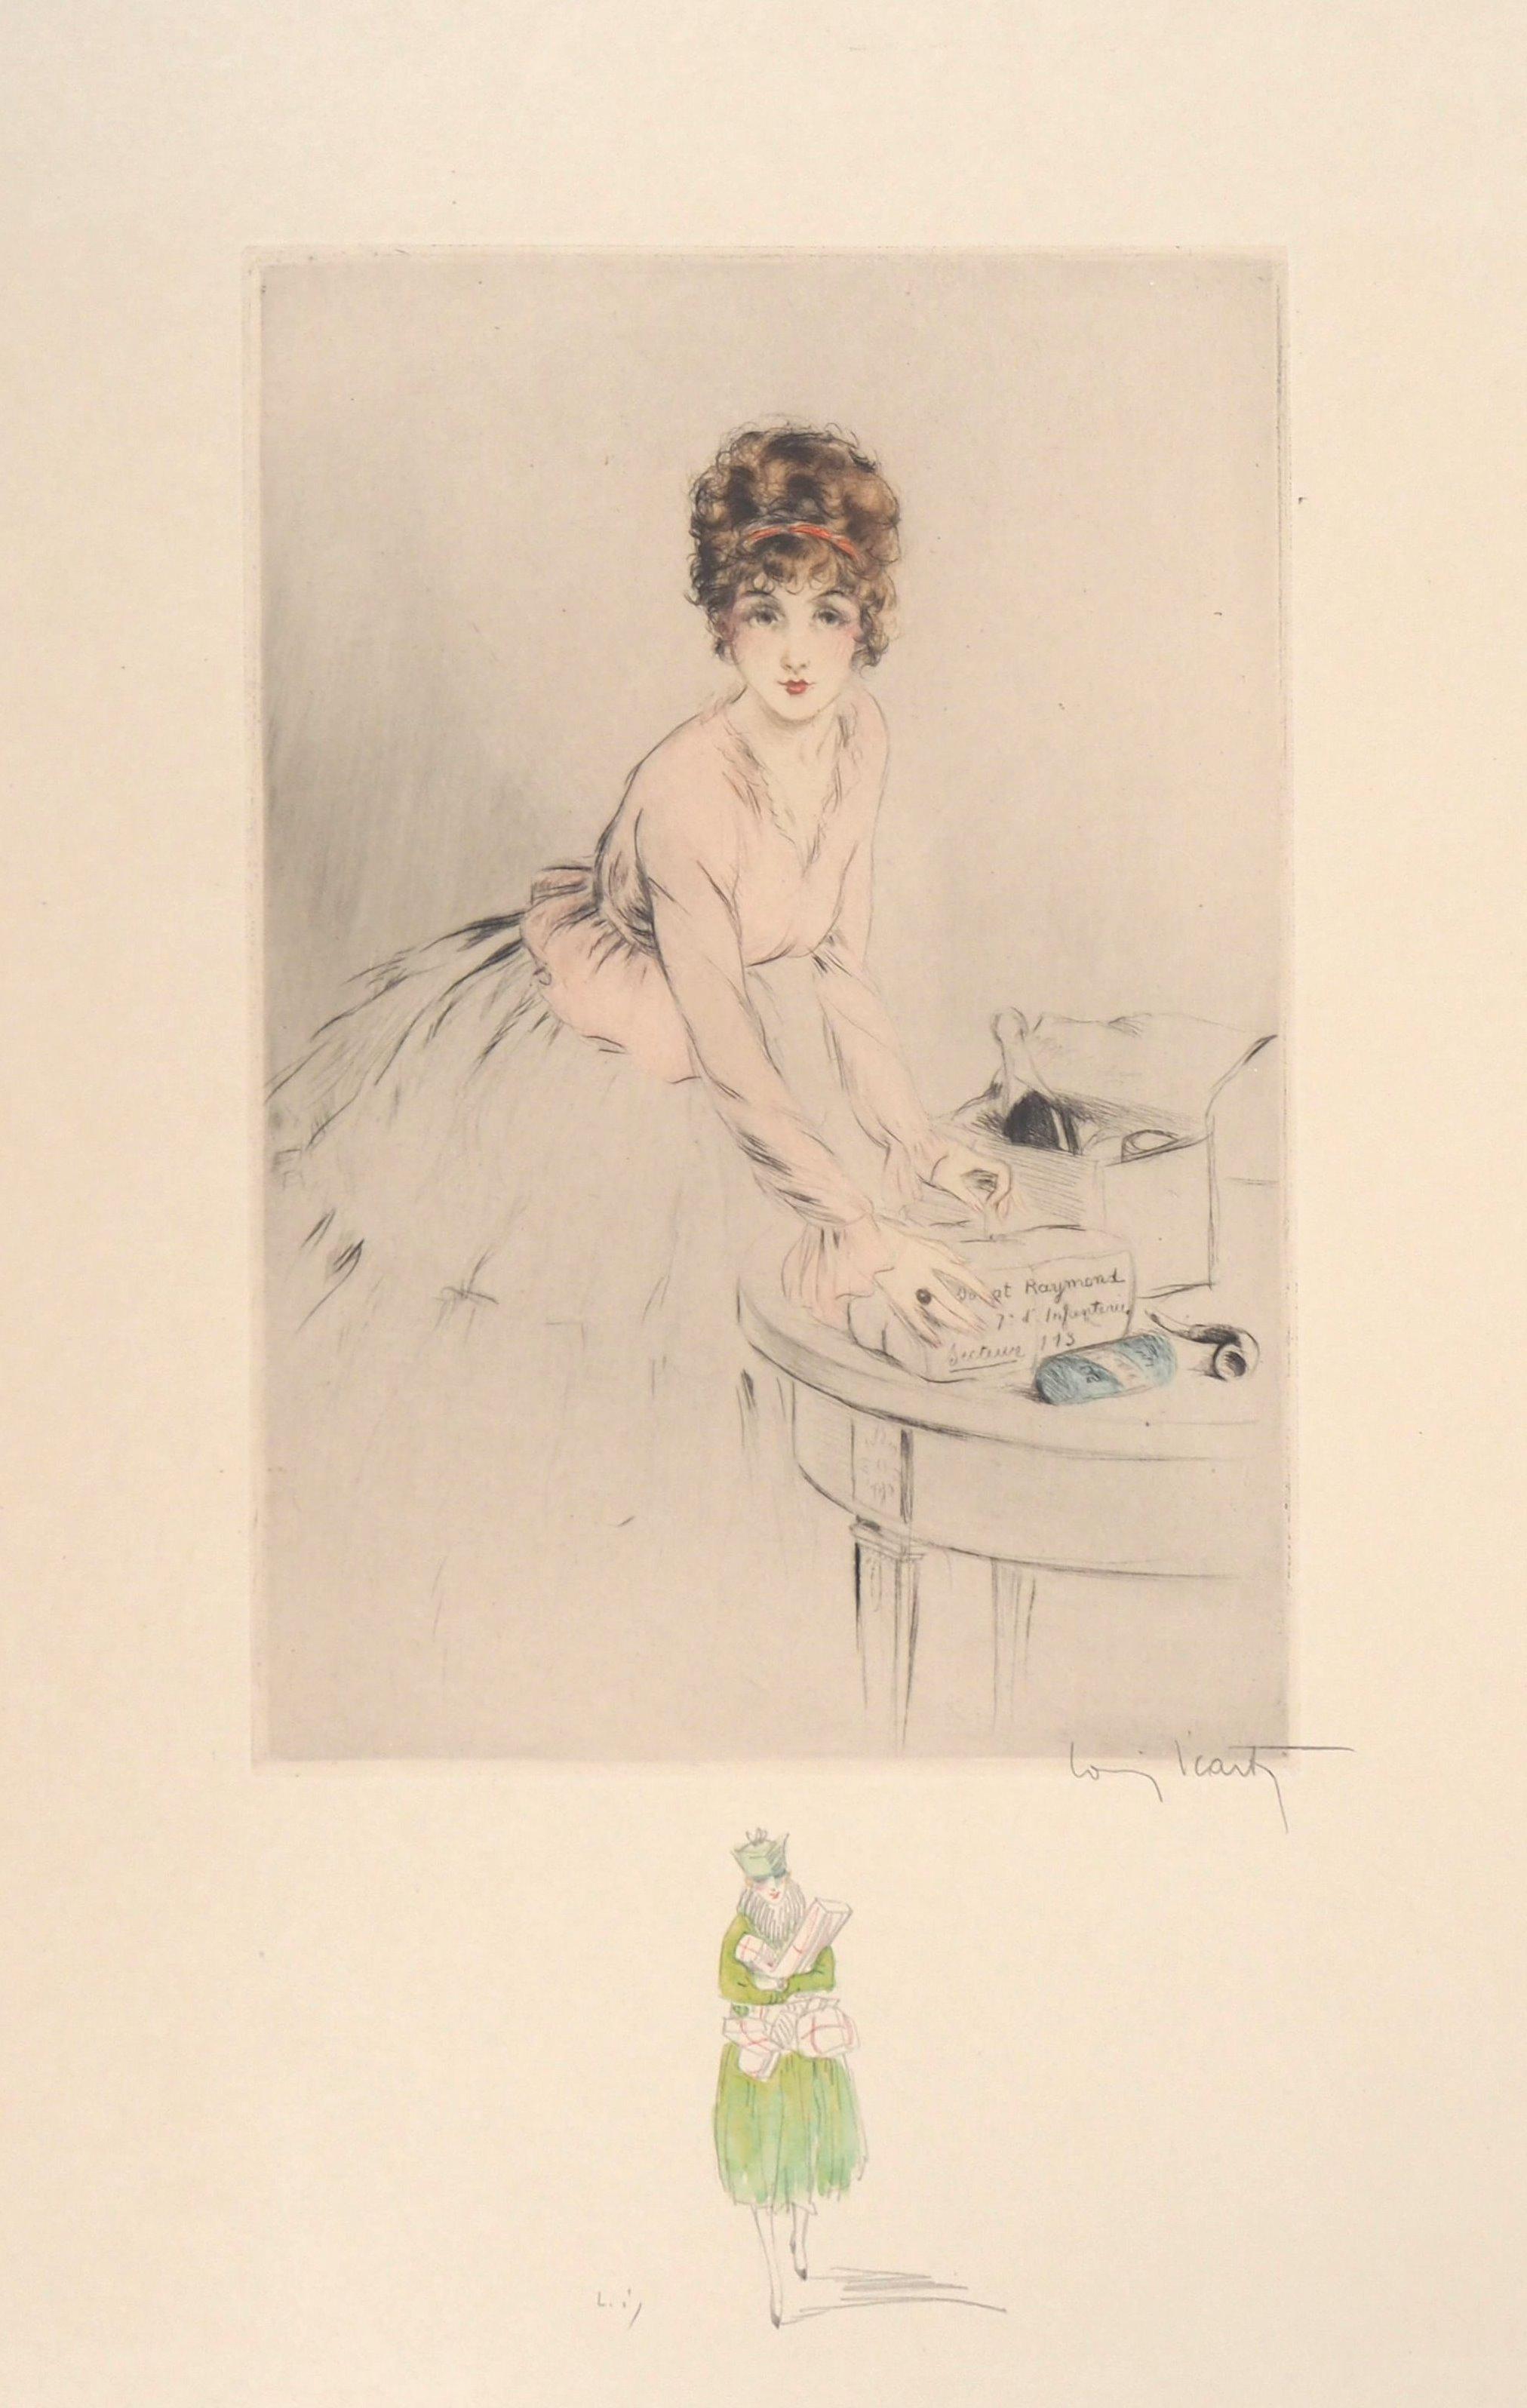 Dressmaker - Original Handsigned Etching and Watercolor drawing